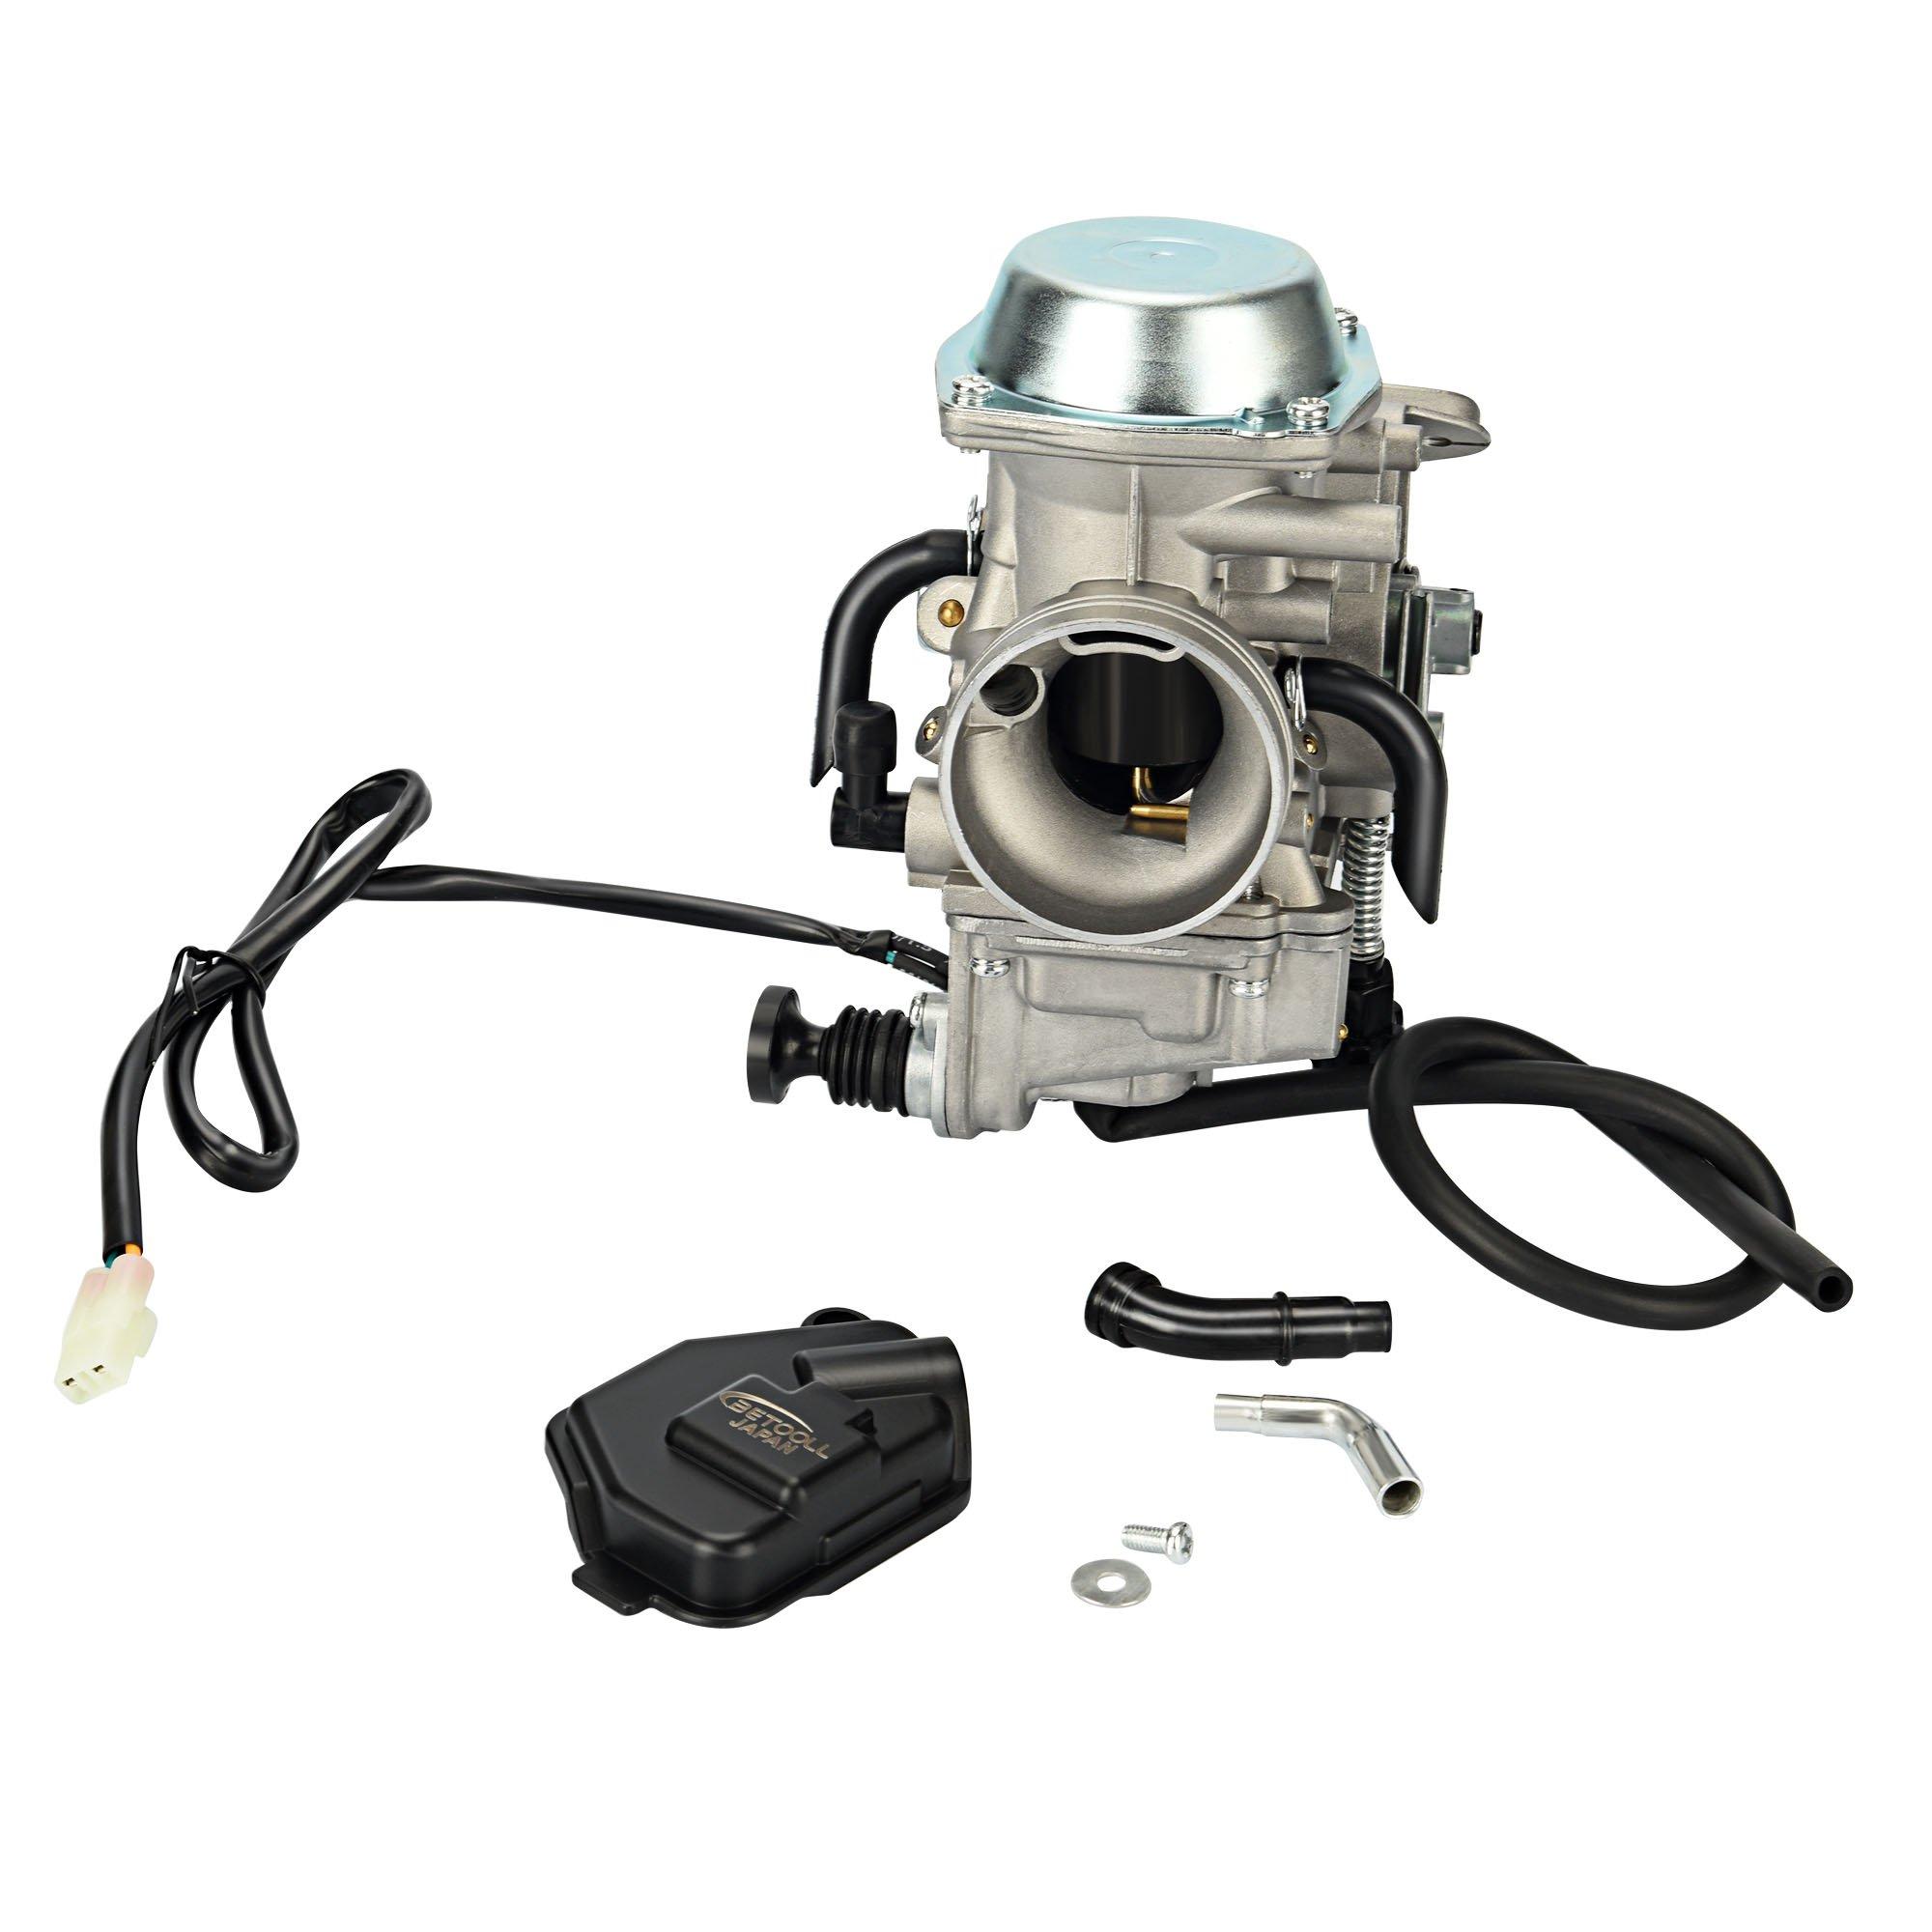 BETOOLL Replacement Carburetor for Honda TRX350 ATV Carburetor TRX 350 Rancher 350ES/FE/FMTE/TM/CARB 2000-2006 TRX300 1988-2000 TRX400 TRX 400FW Foreman CARB, TRX 450 Carburetor TRX450F (with Heater)